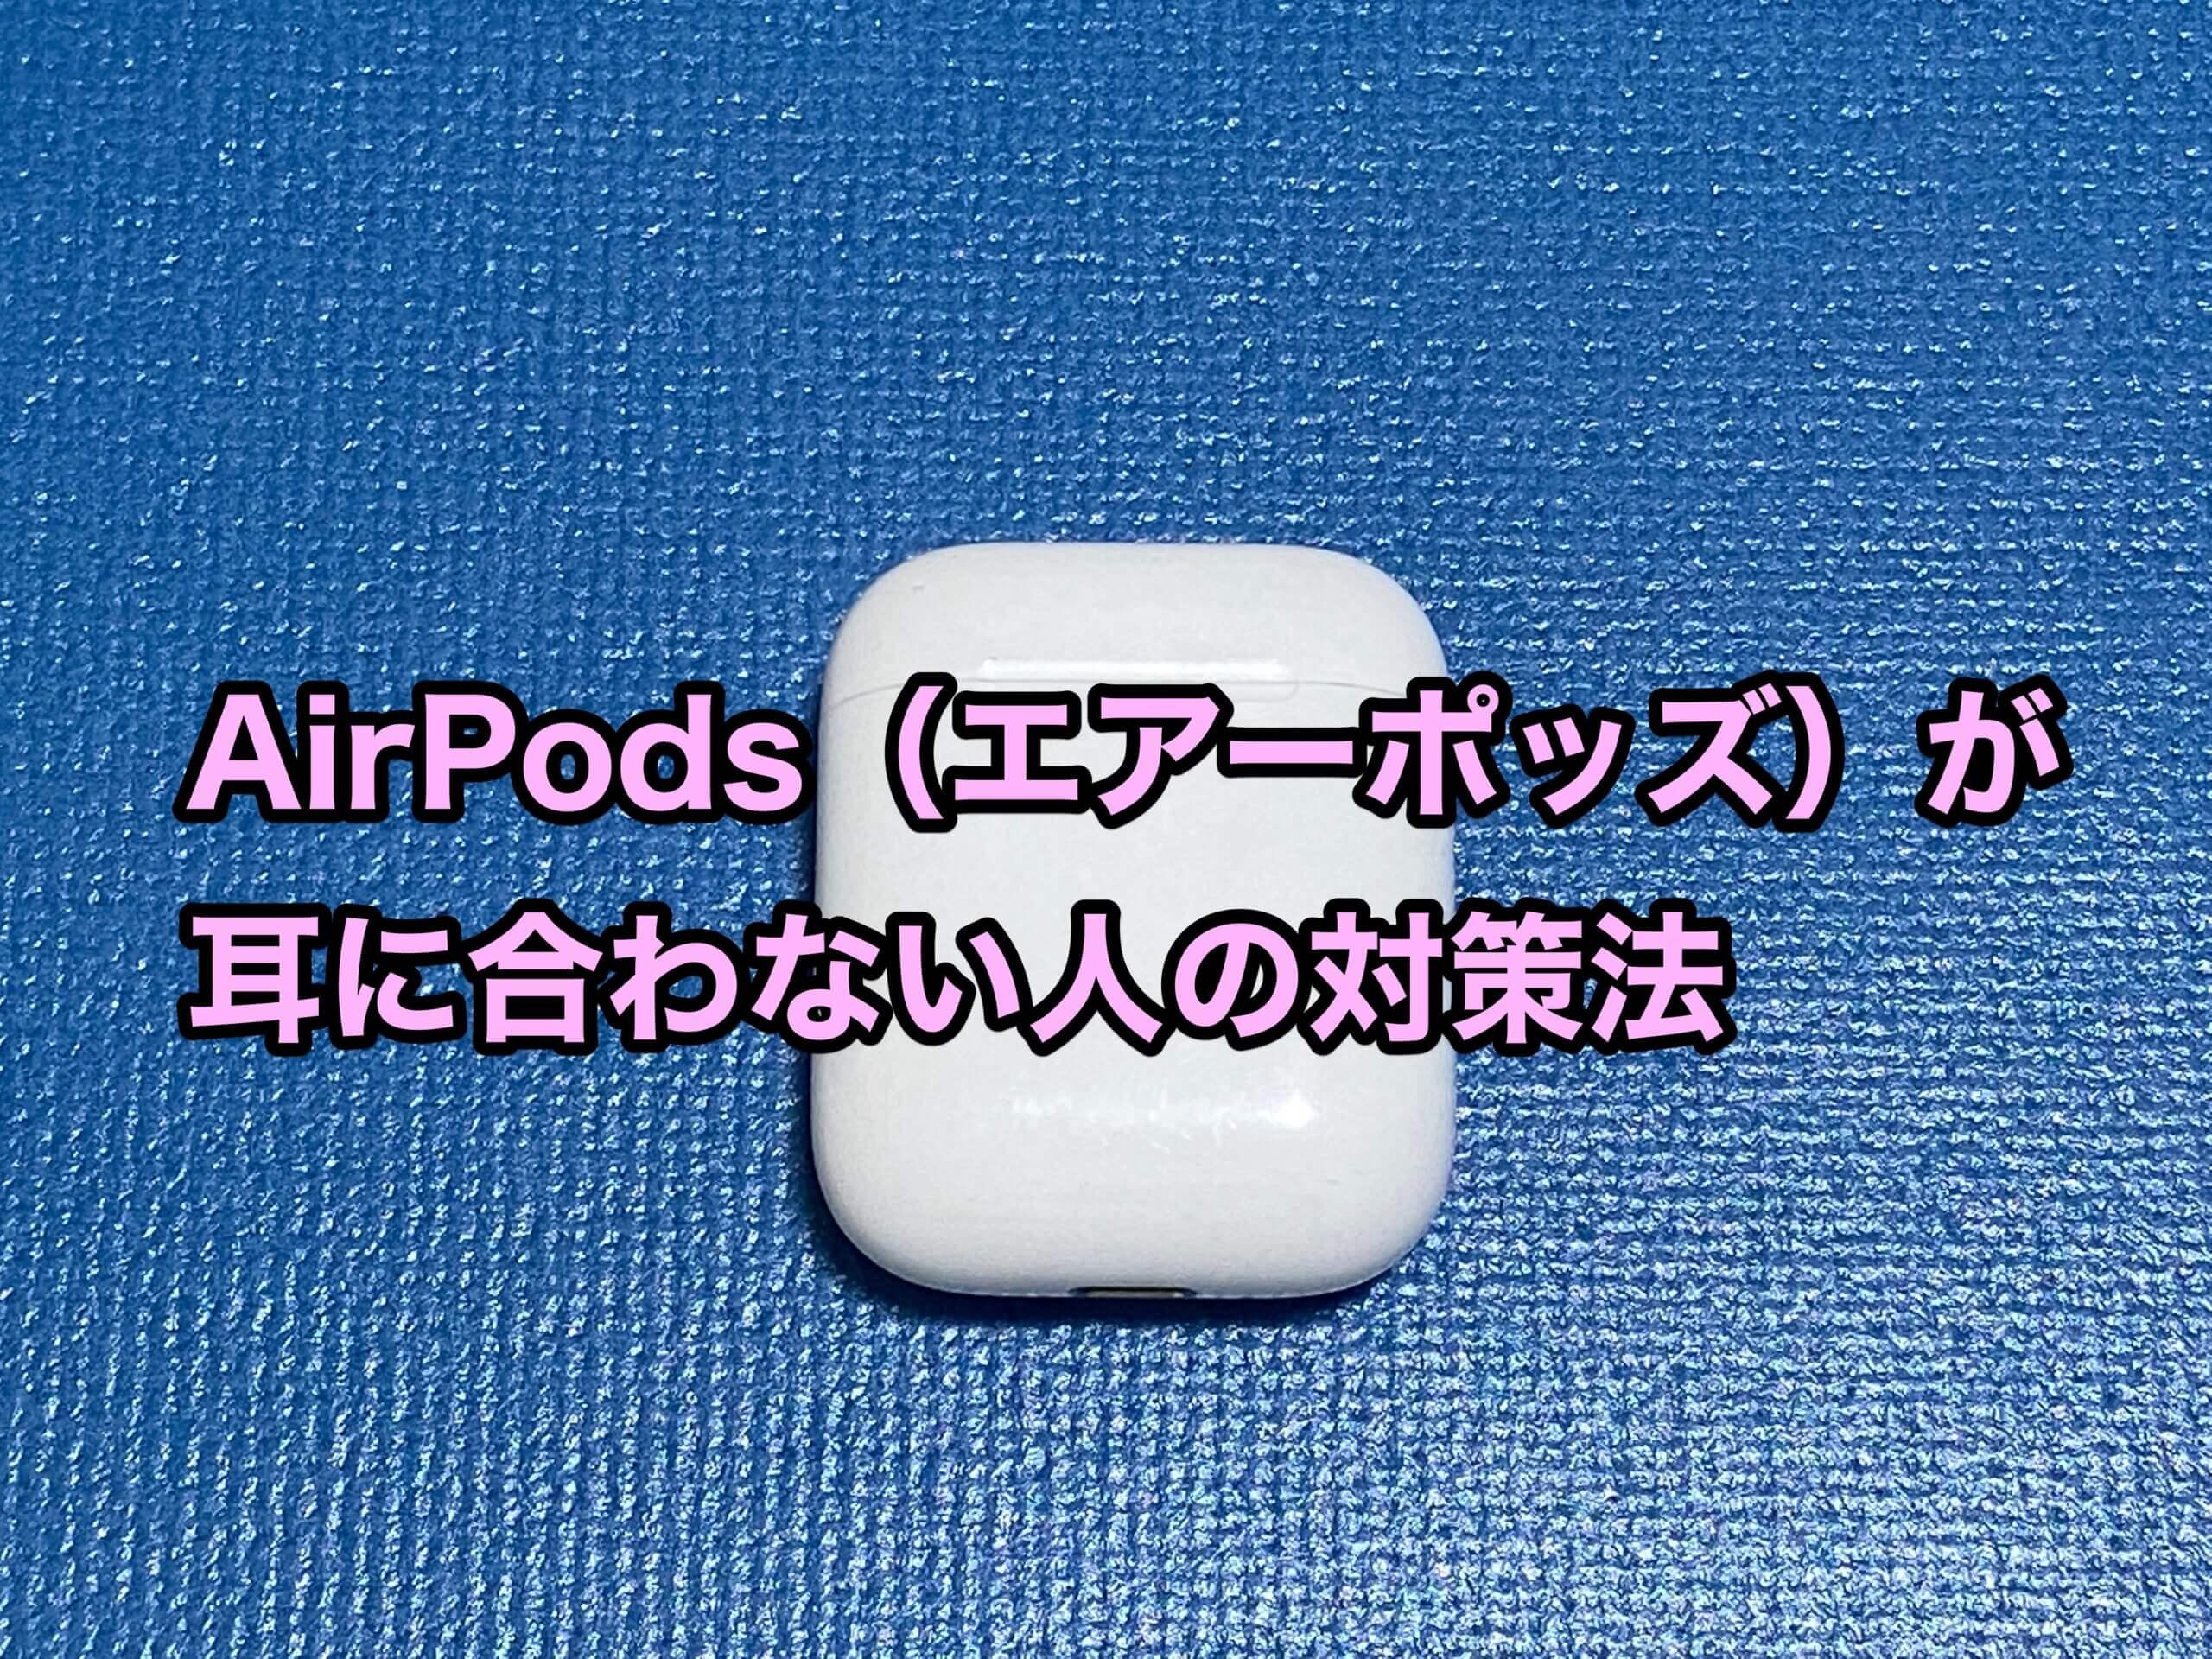 AirPods(エアーポッズ)が耳に合わない人必見!落ちない付け方を解説